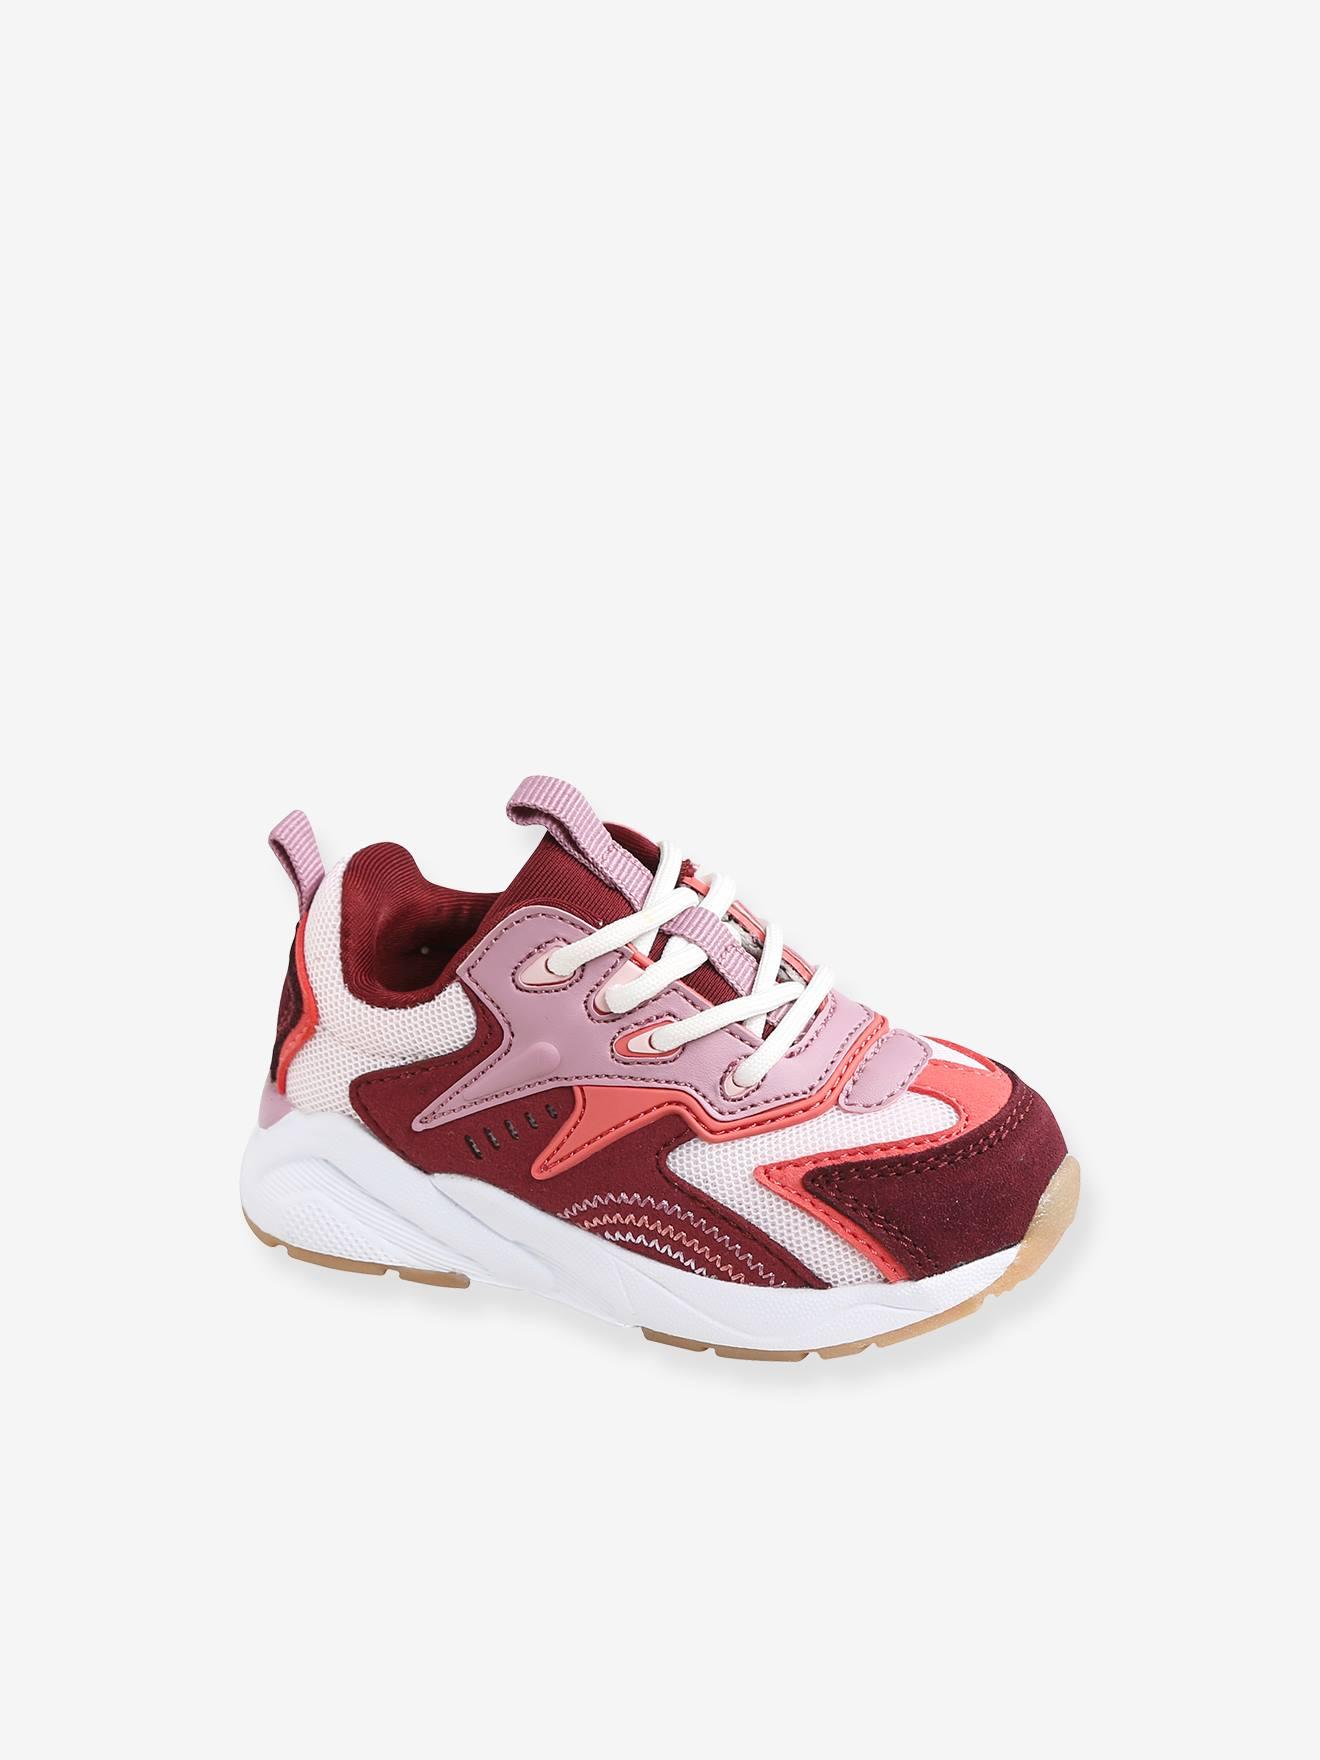 Baskets lacées bébé fille esprit running rose